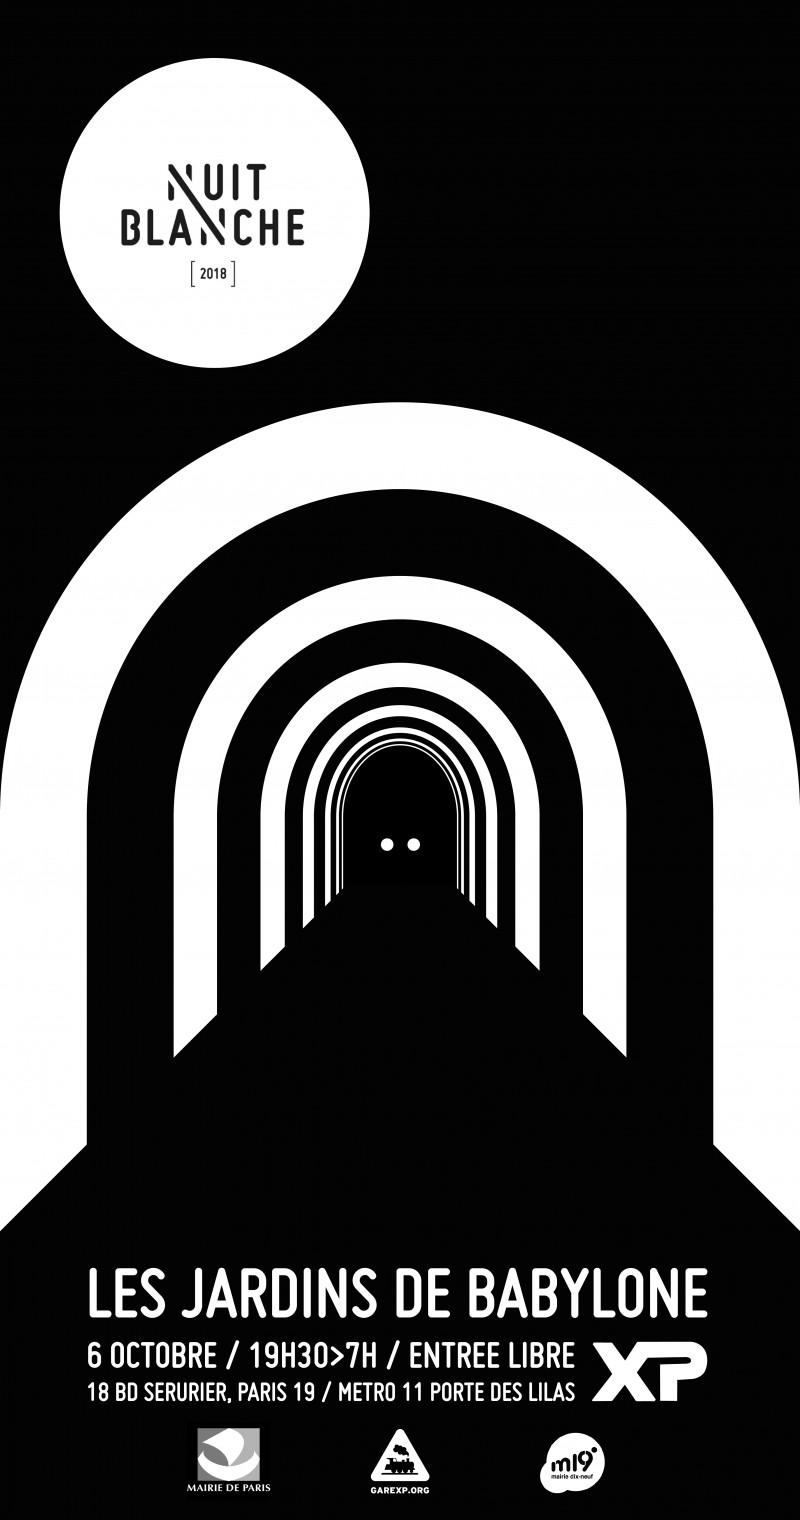 affiche-nuit-blanche-2018-gare-xp-a832a8a91e096e3e492f49c287aea6b7